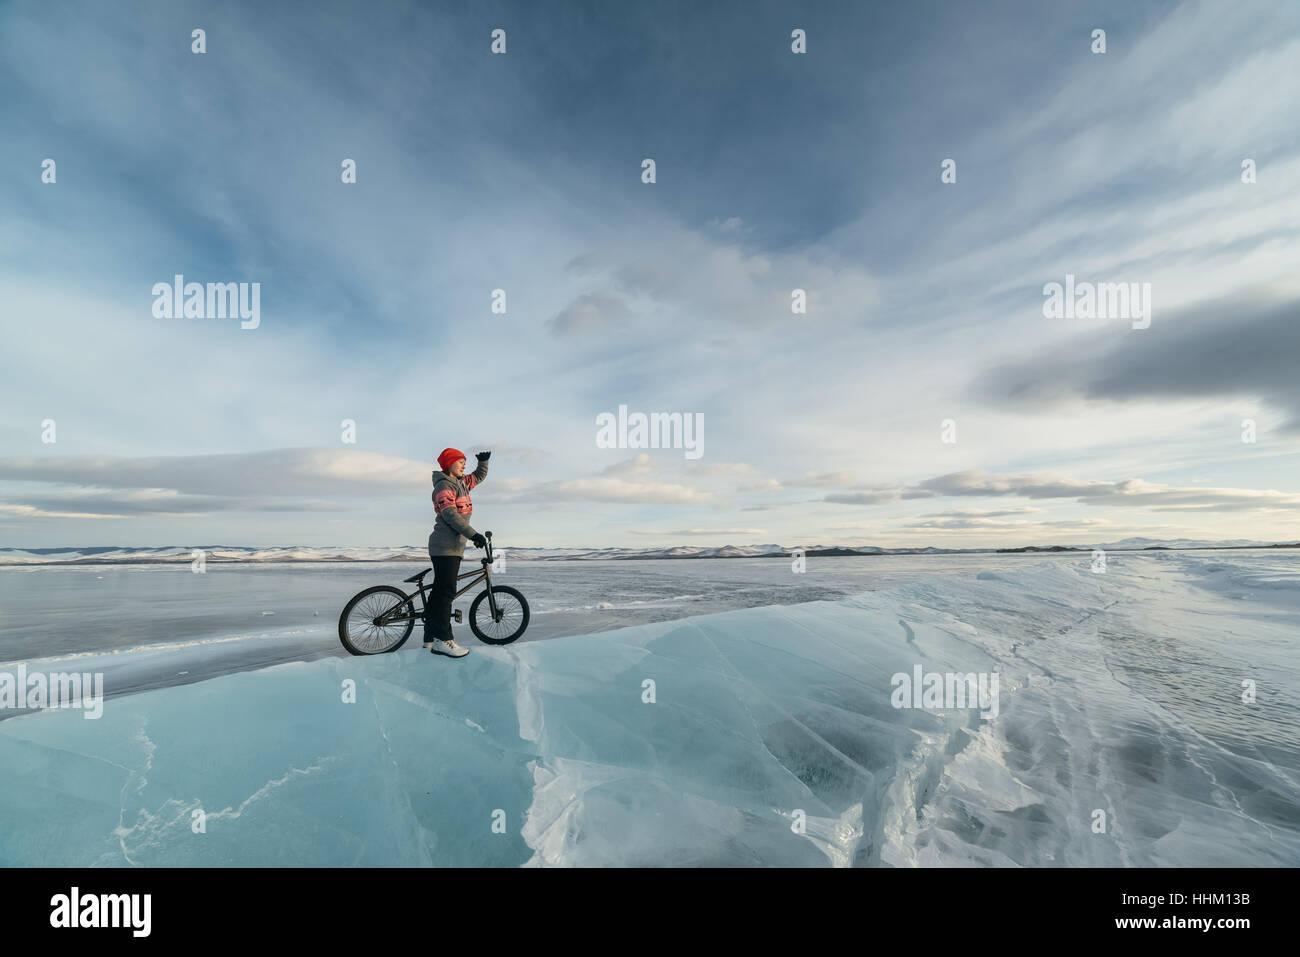 Girl on a bmx on ice. - Stock Image